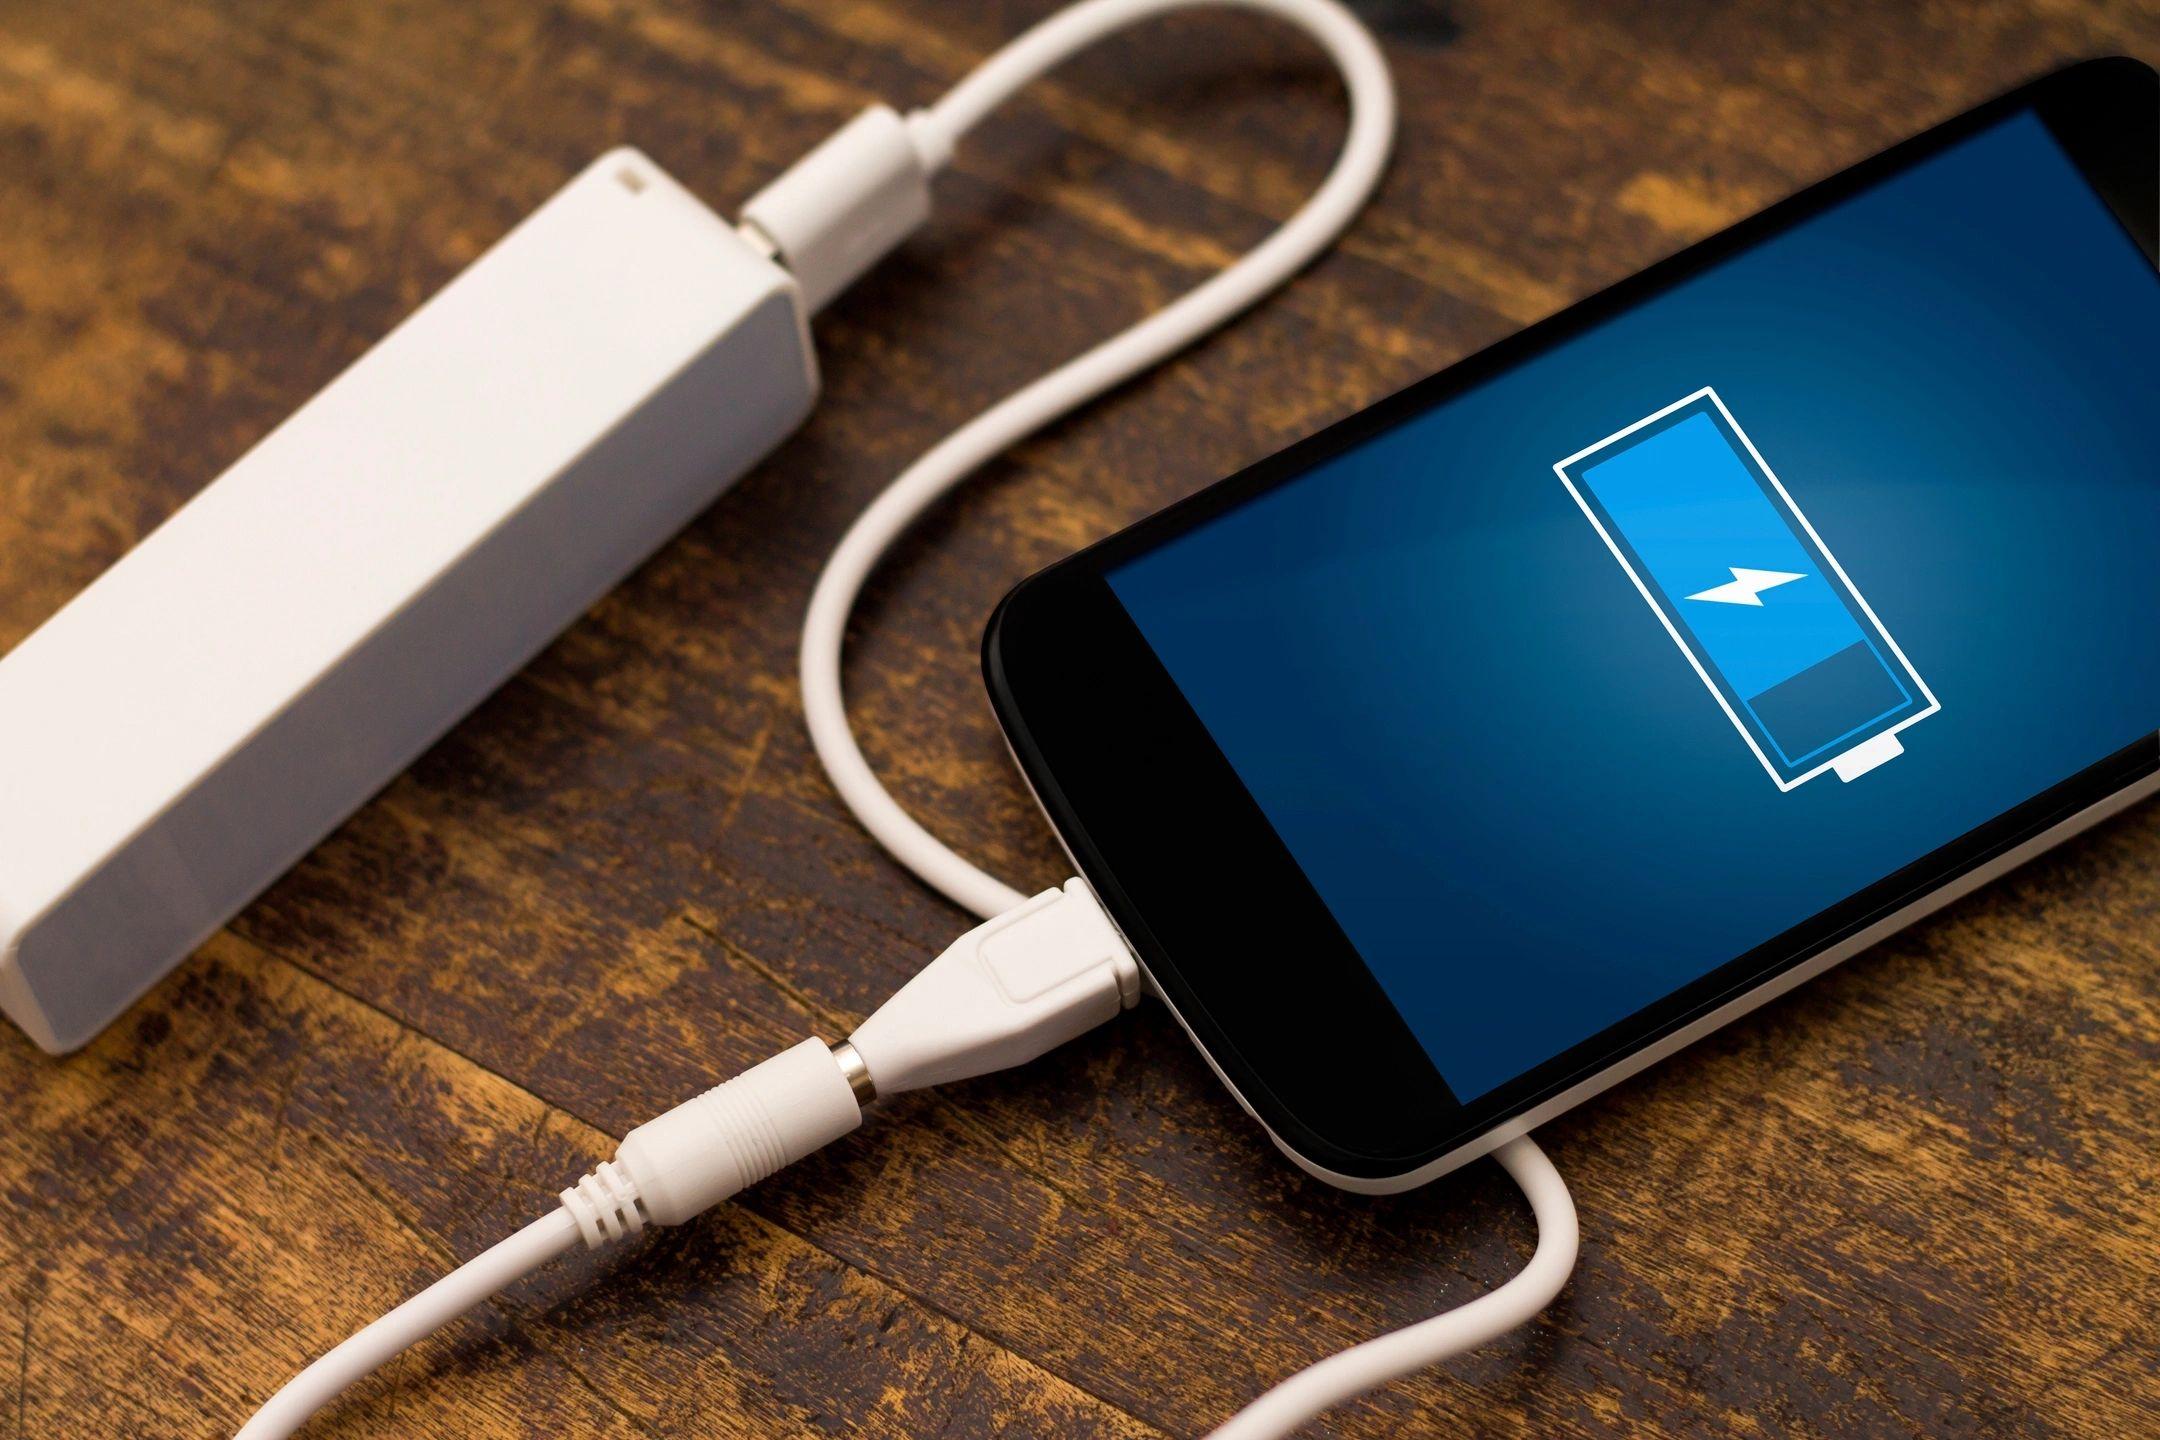 Unplugging Unused Appliances: 4 Benefits